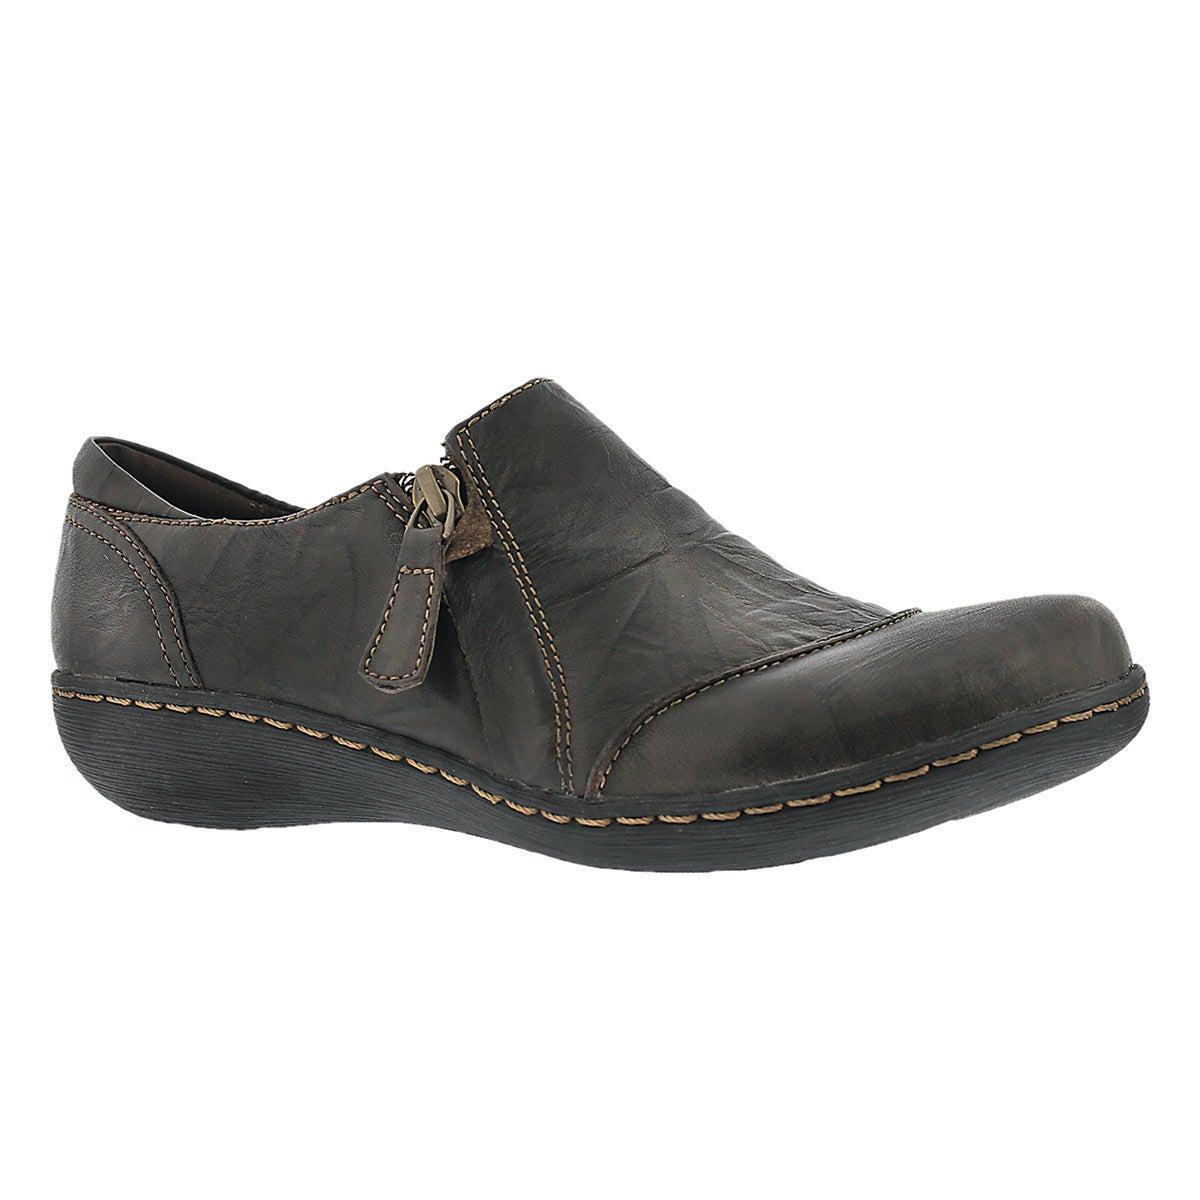 Lds Fianna Cleo brown casual shoe